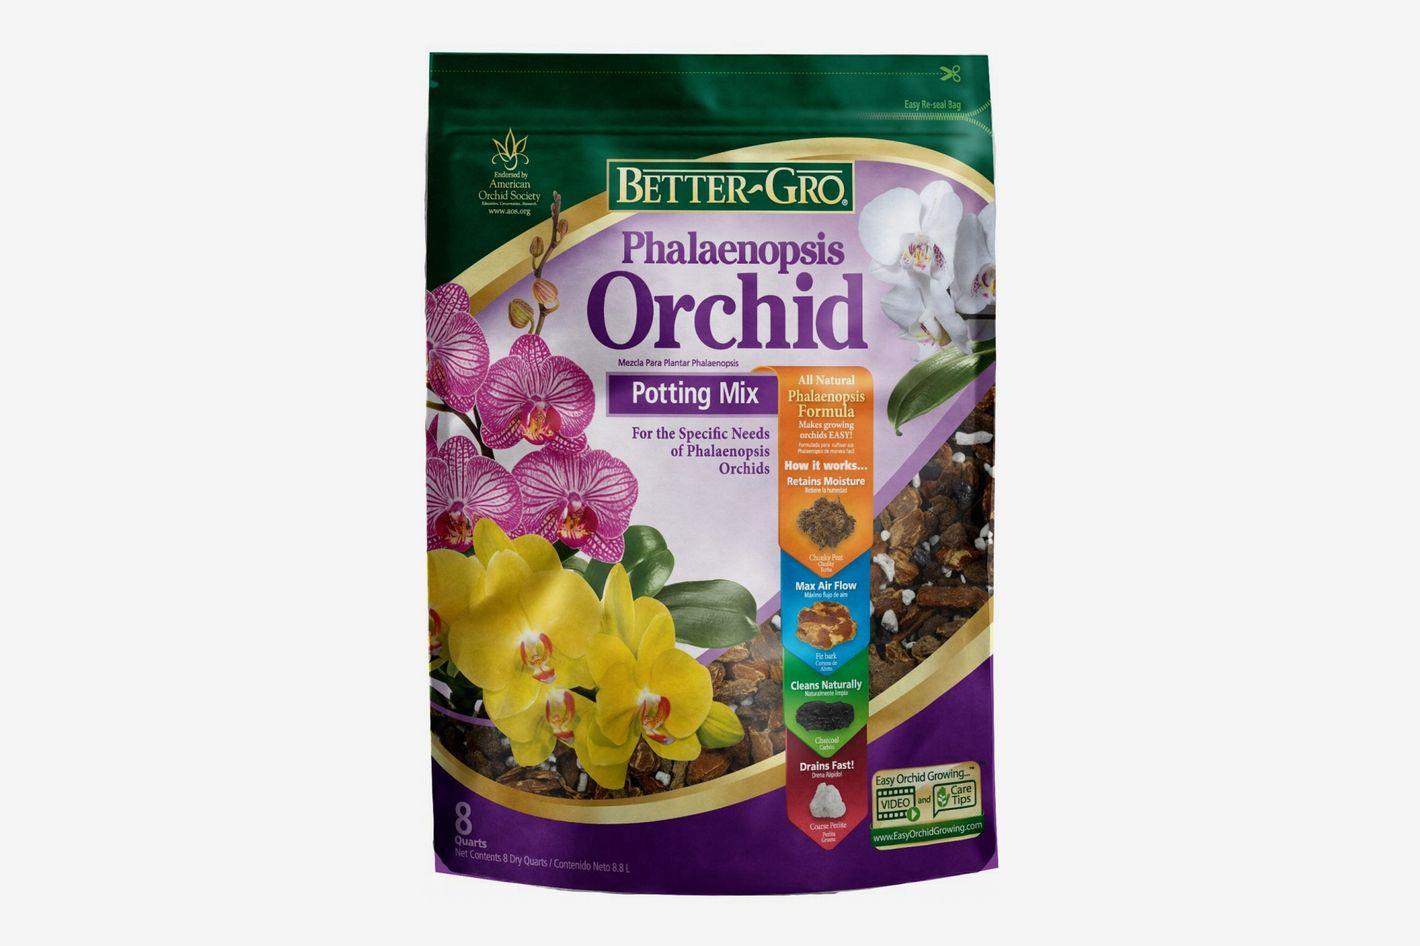 Better-Gro Phalaenopsis Mix, 8 Quarts